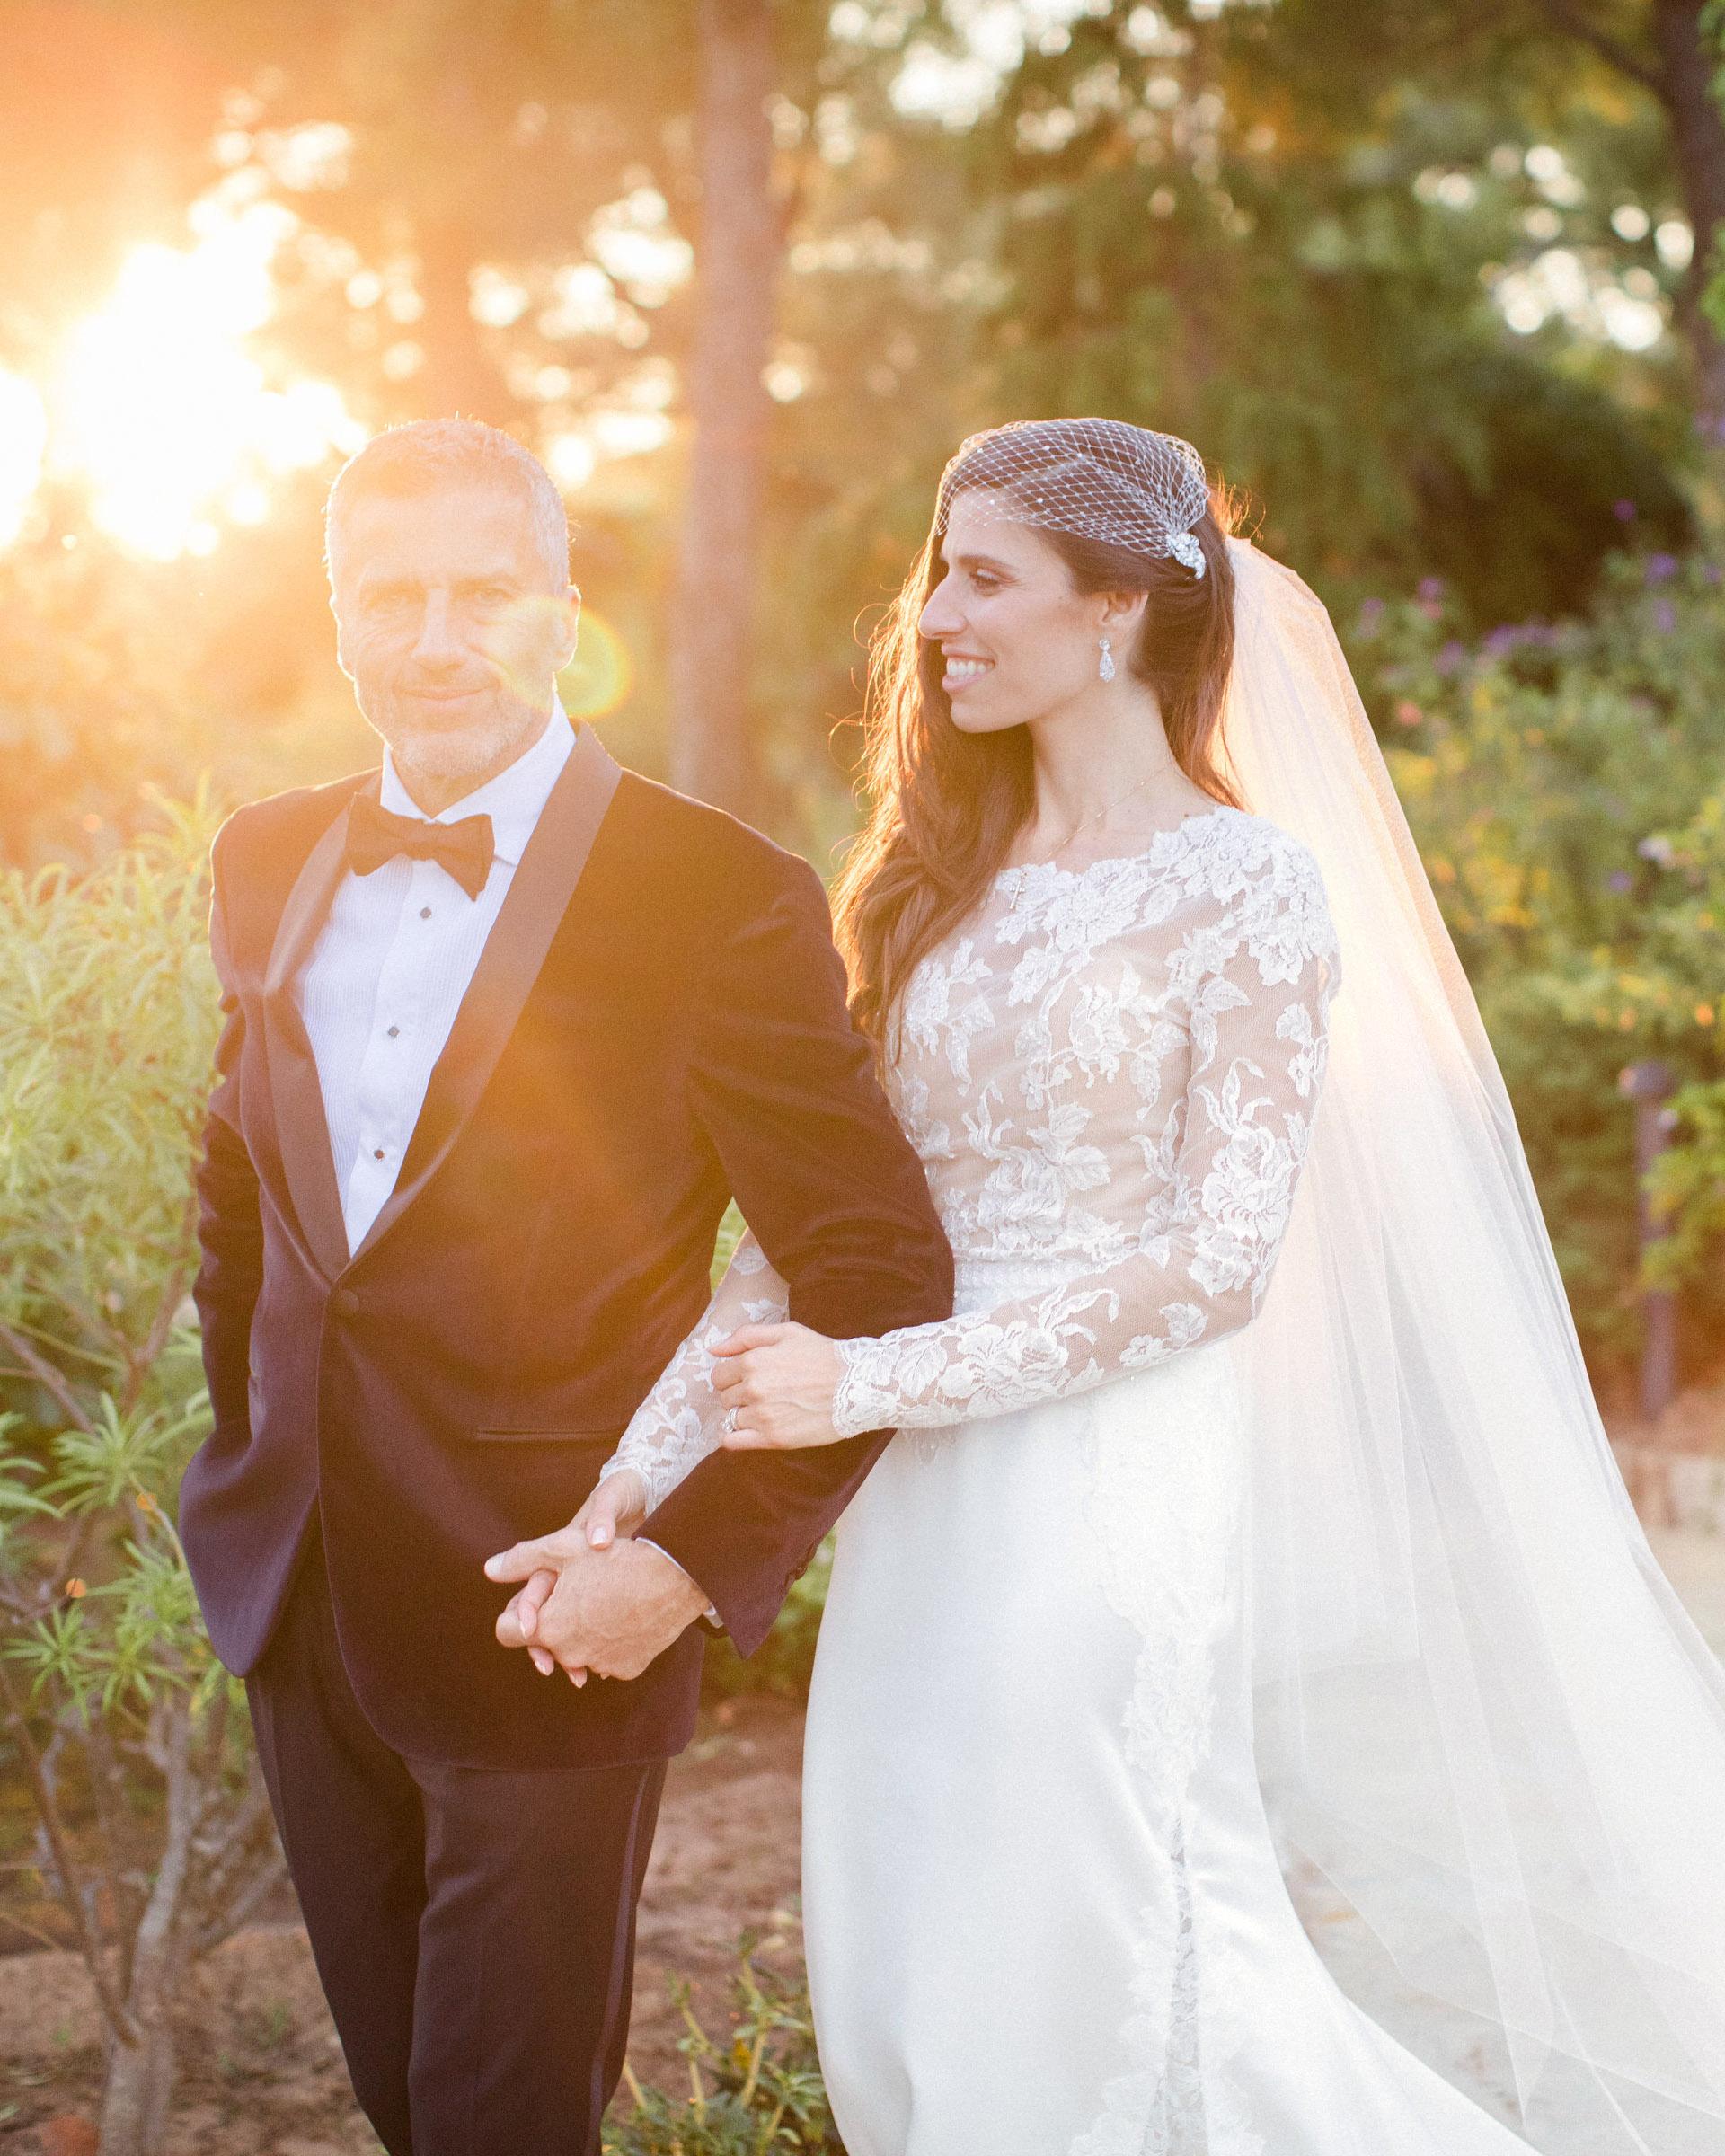 jiannina enzo wedding couple arm in arm